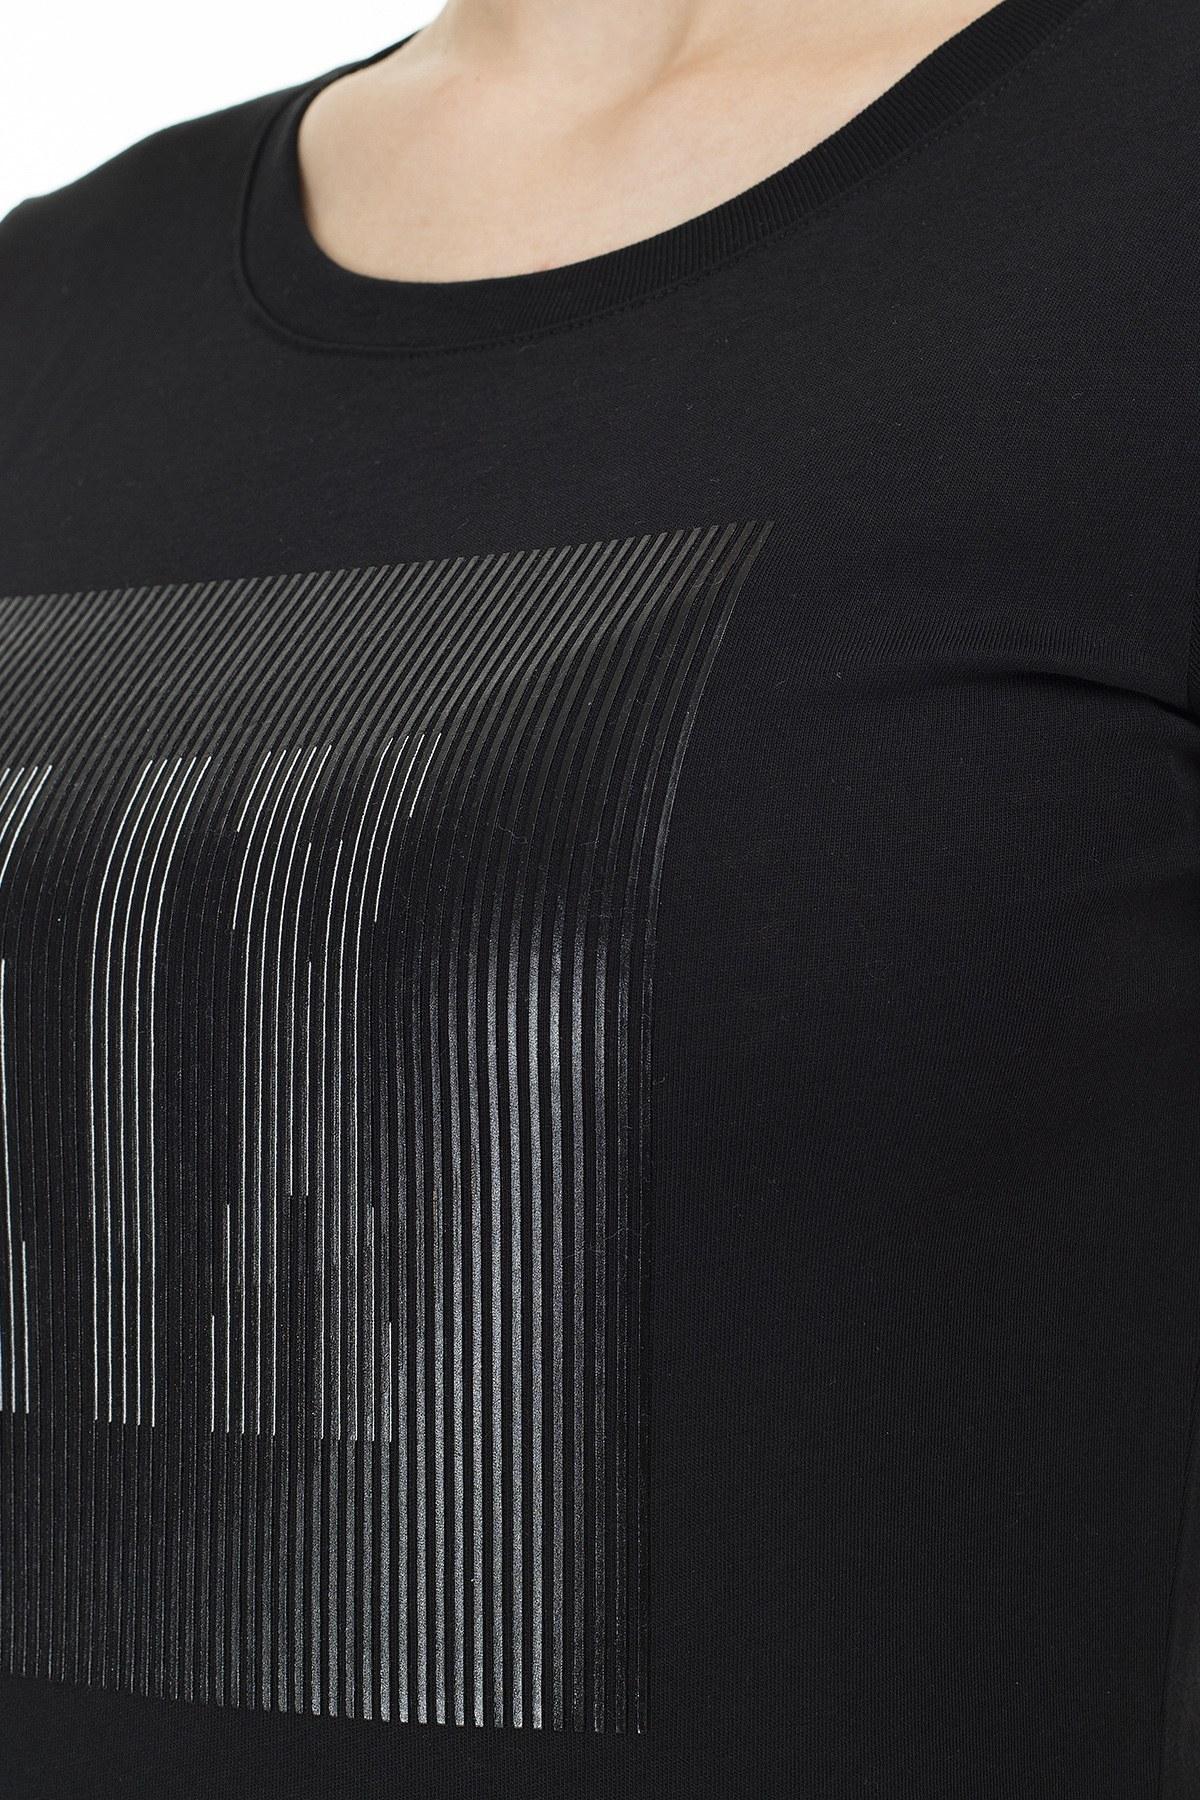 Armani Exchange Baskılı % 100 Pamuk Bisiklet Yaka Kadın T Shirt 3HYTBM YJ3CZ 1200 SİYAH